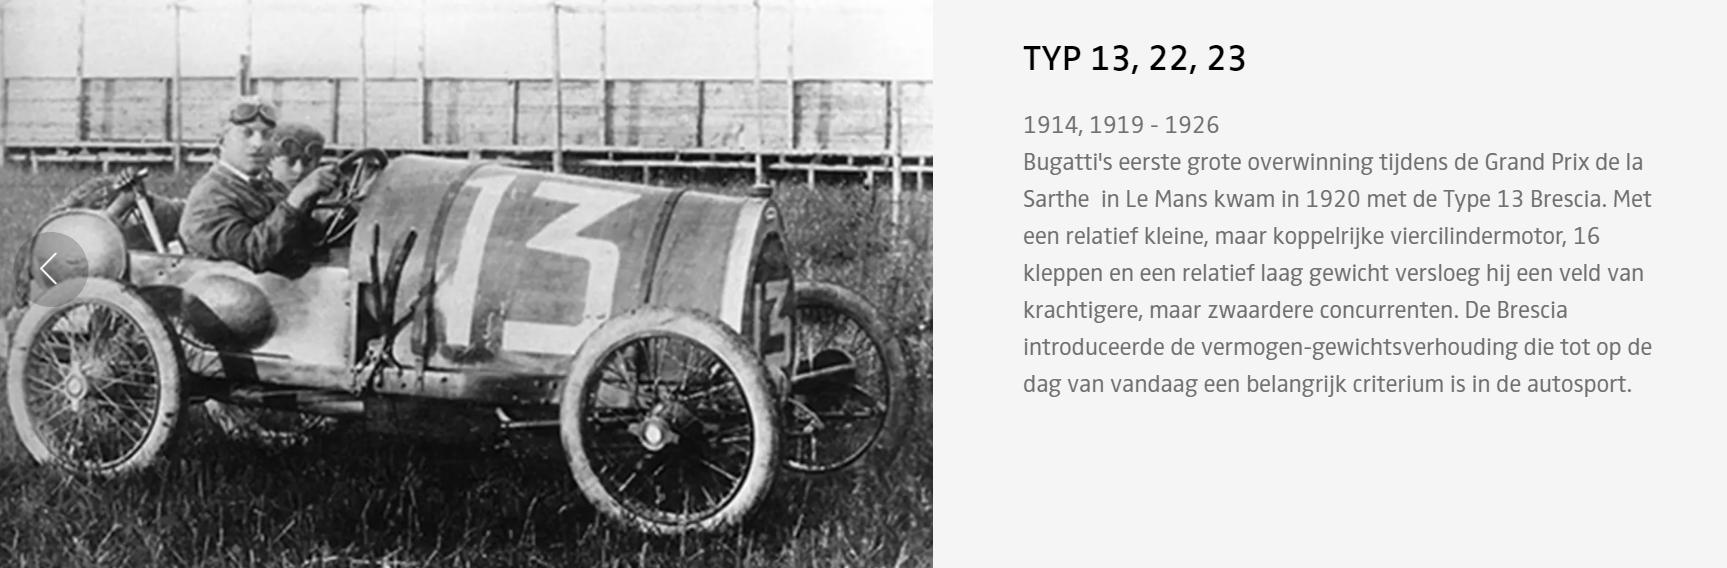 0-Bugatti--Type-13-22-23